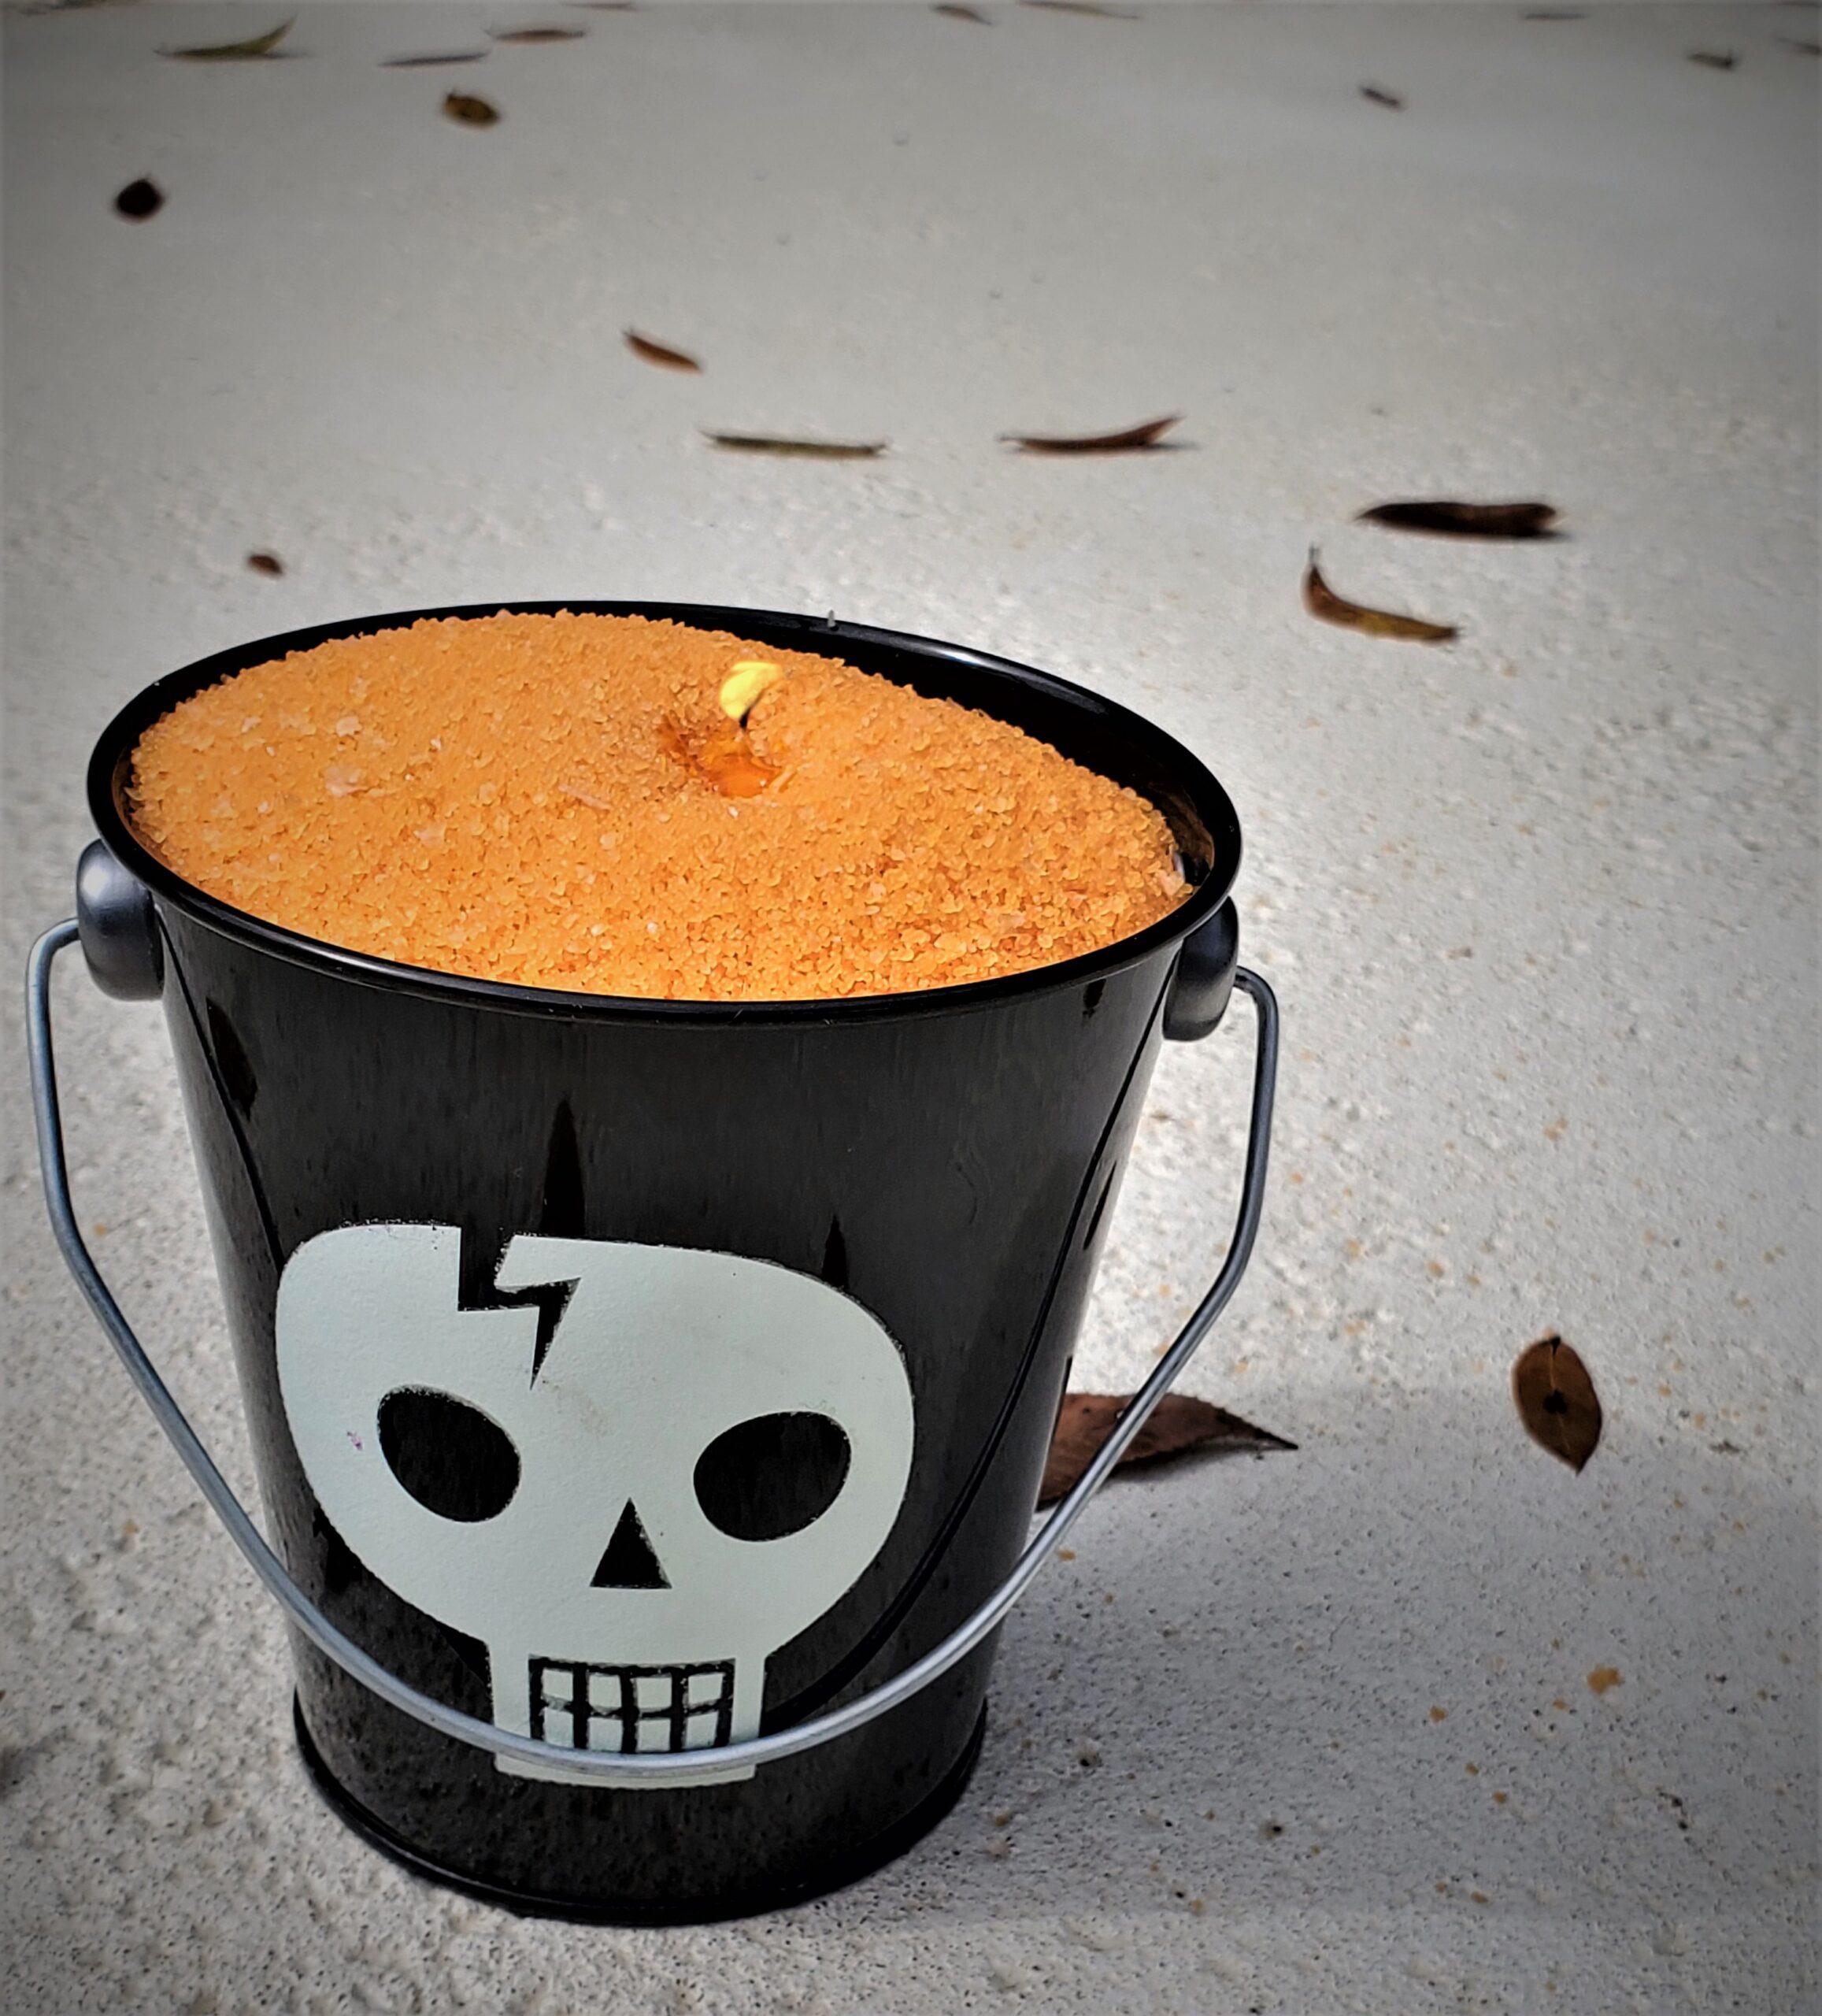 Candle Sand wax orange